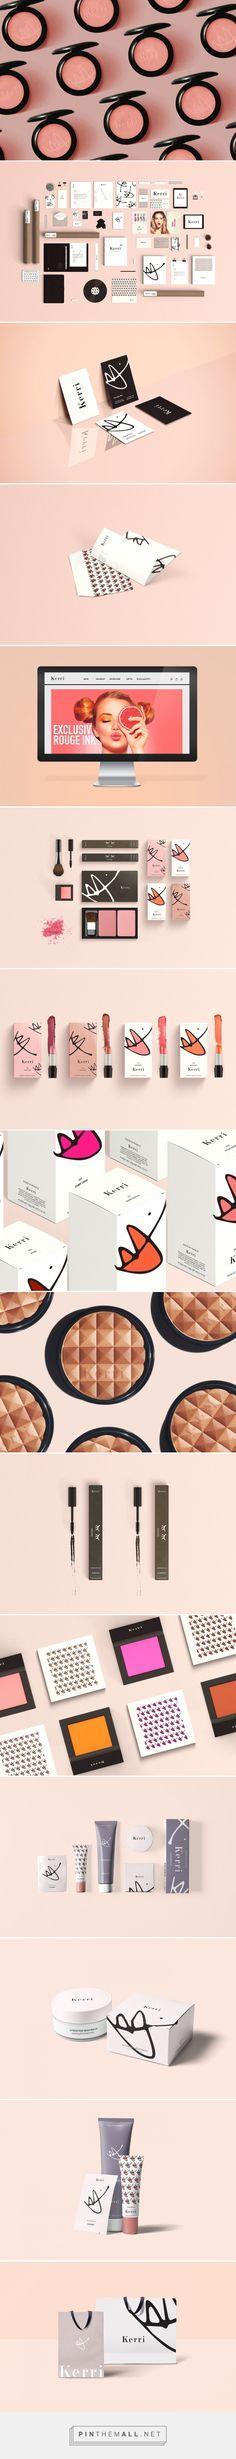 Kerri Cosmetics Branding and Packaging by Danielle Han  | Fivestar Branding – Design and Branding Agency & Inspiration Gallery